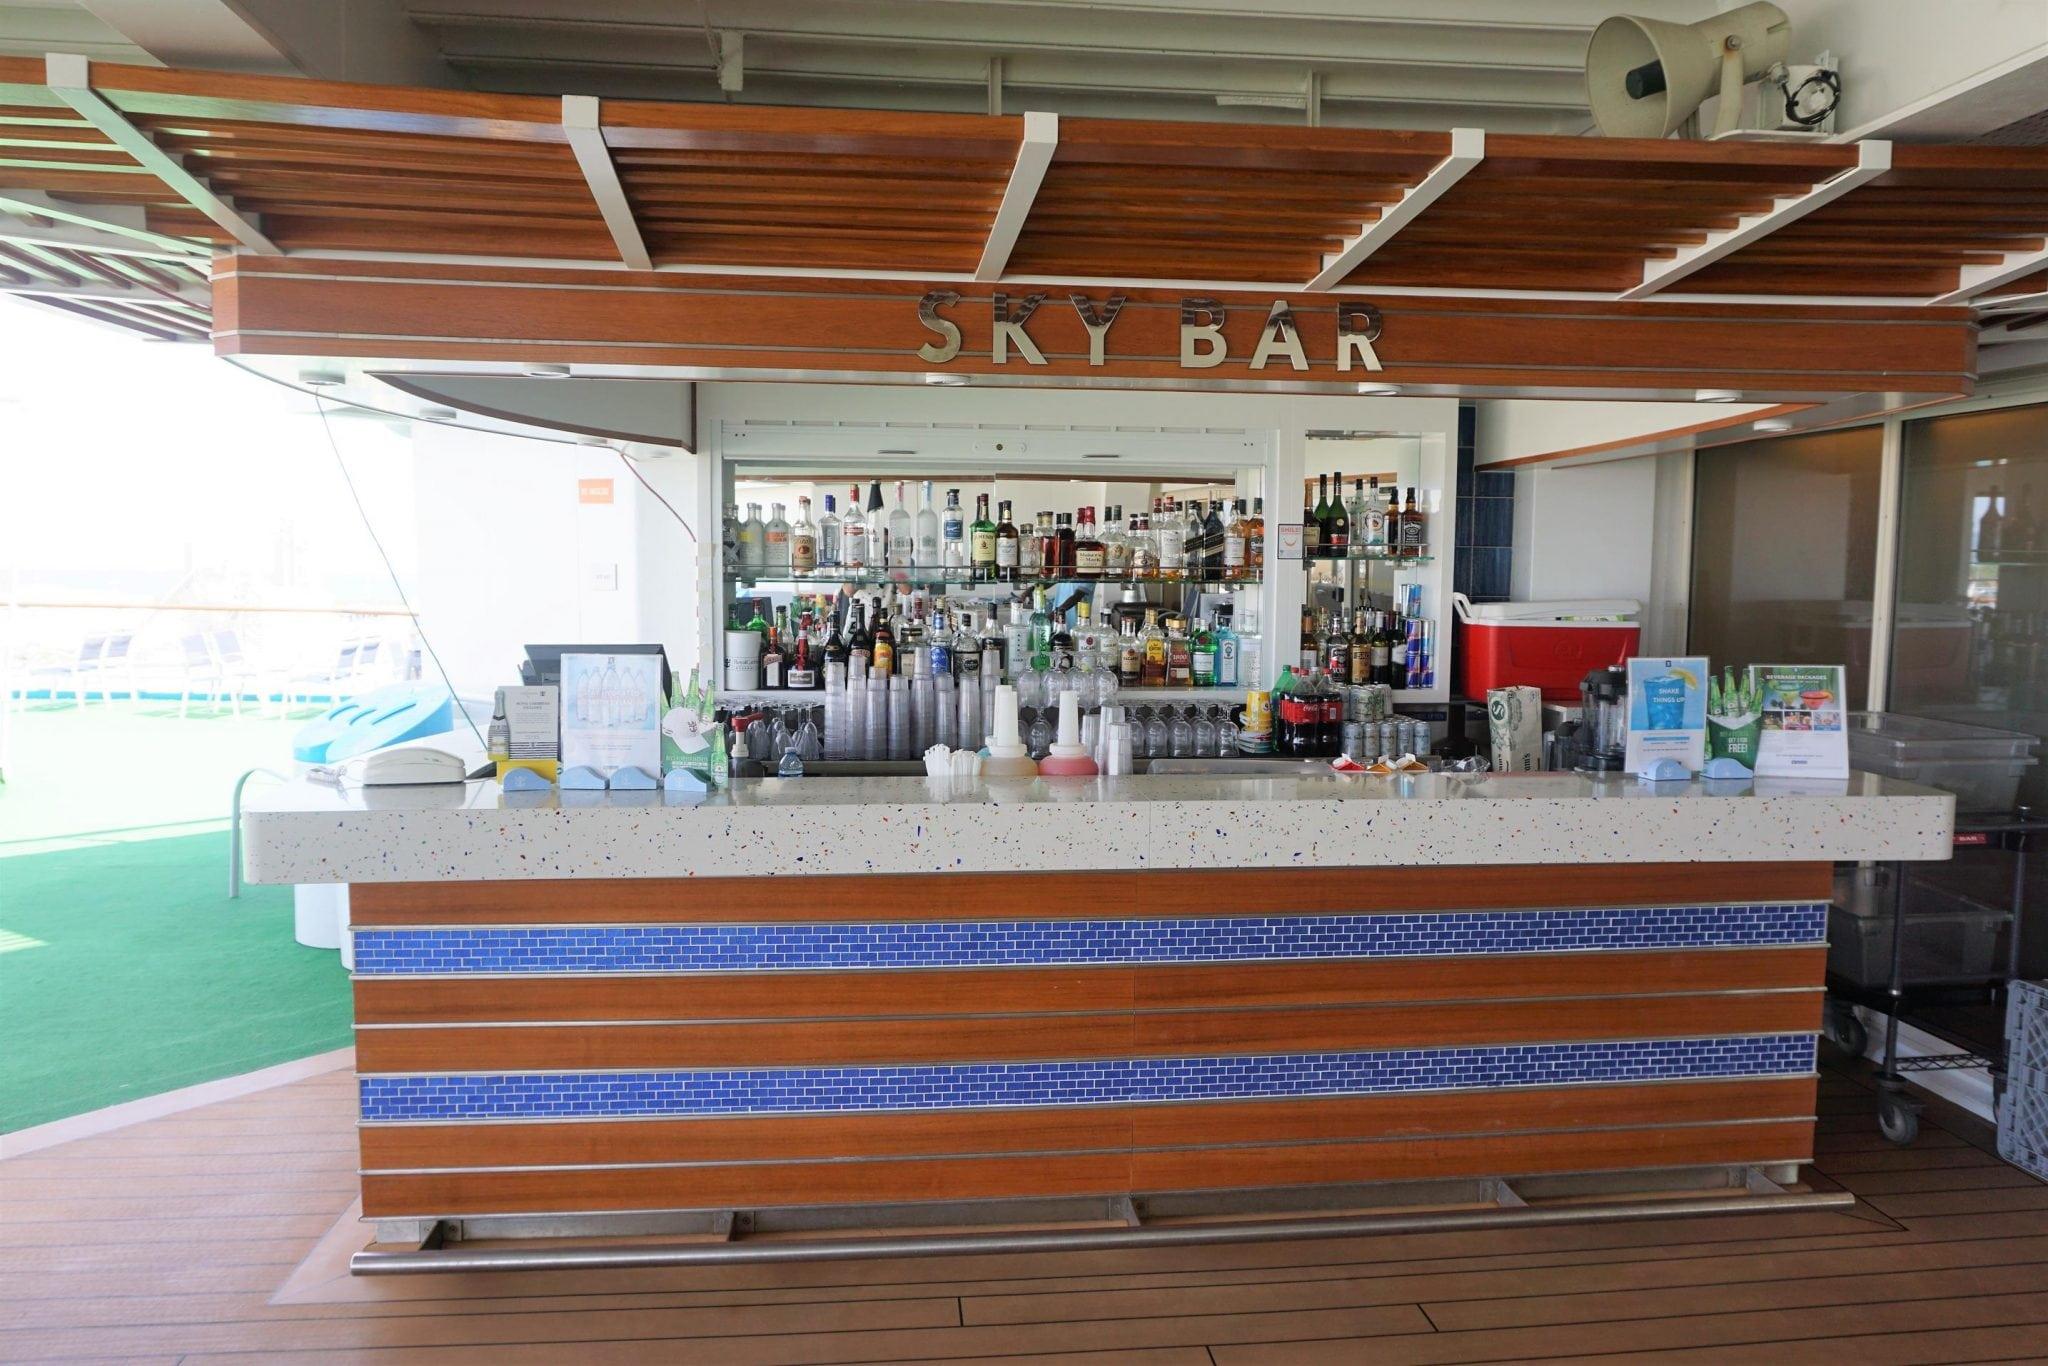 Sky Bar on Majesty of the Seas